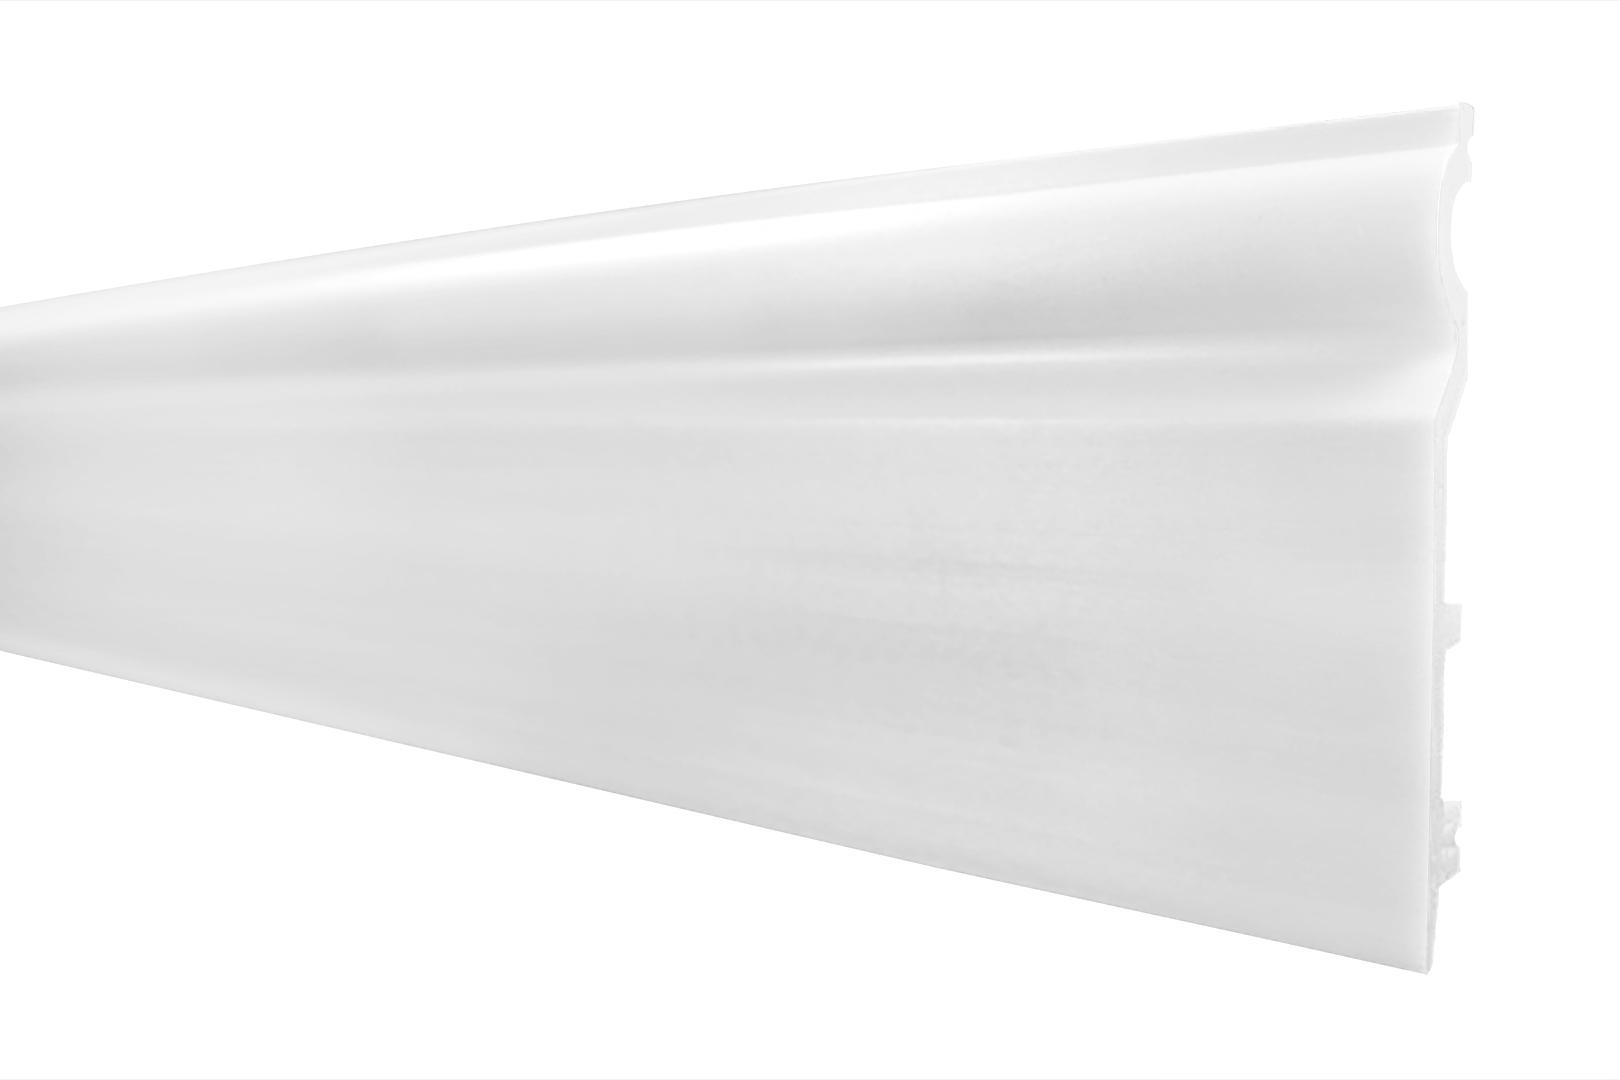 Sockelleisten | Stuck | Fußleiste | Frankfurter | stoßfest | 120x15mm | HF-2